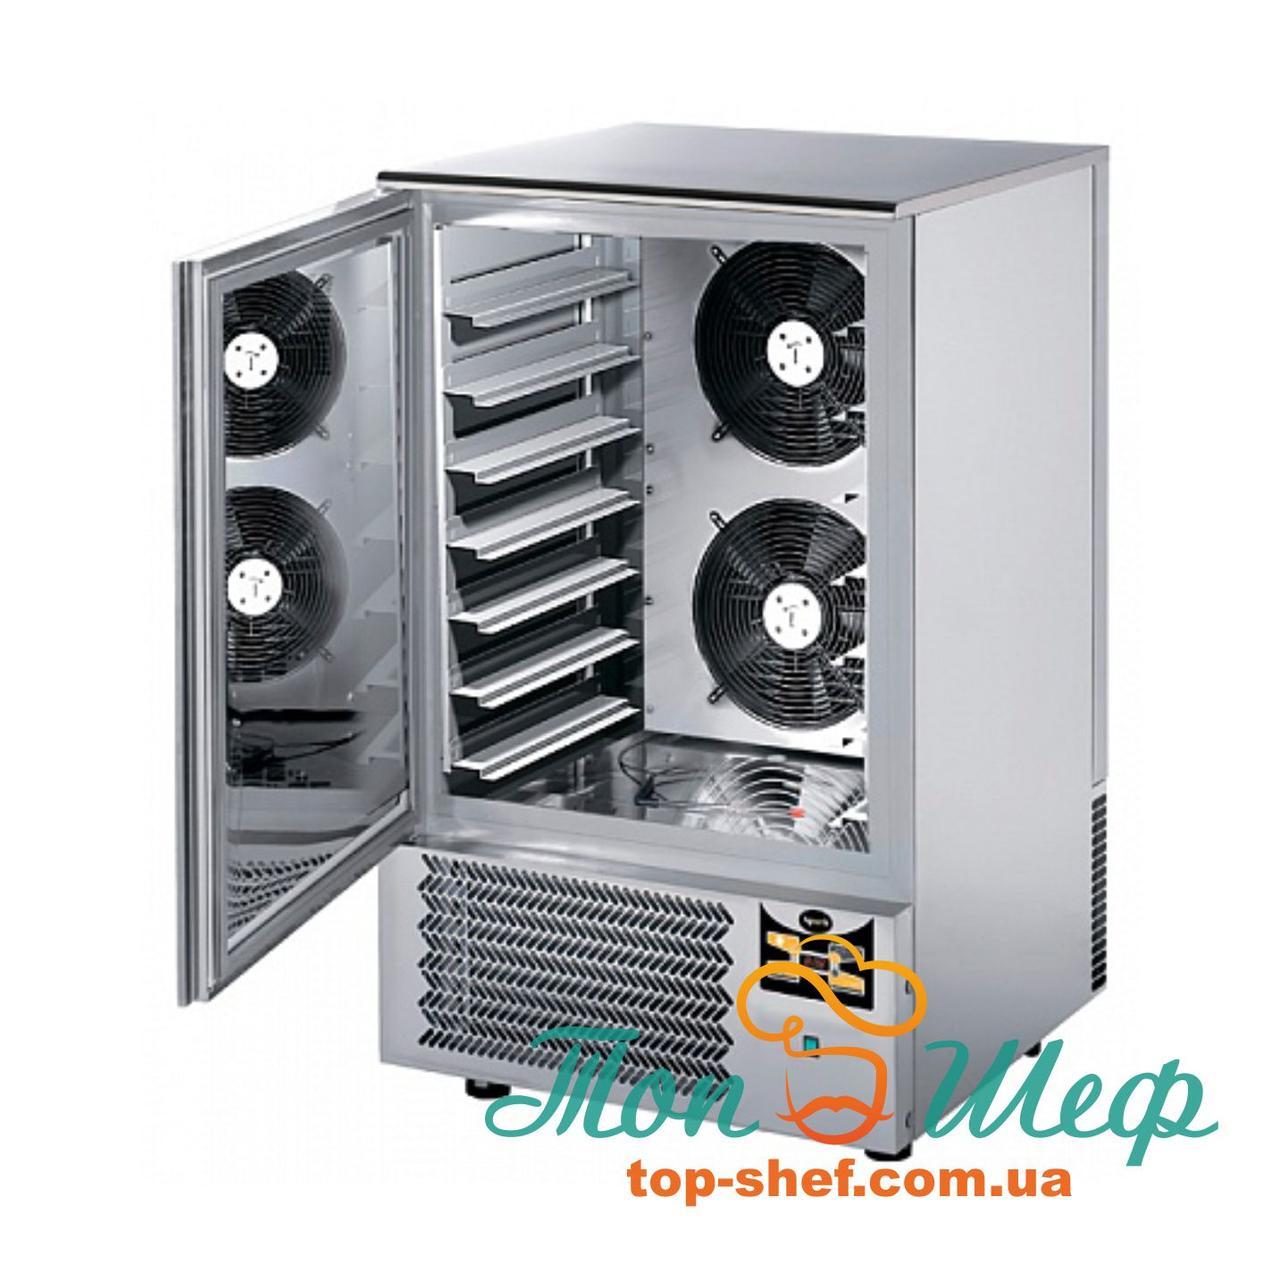 Шкаф шоковой заморозки Apach SH07